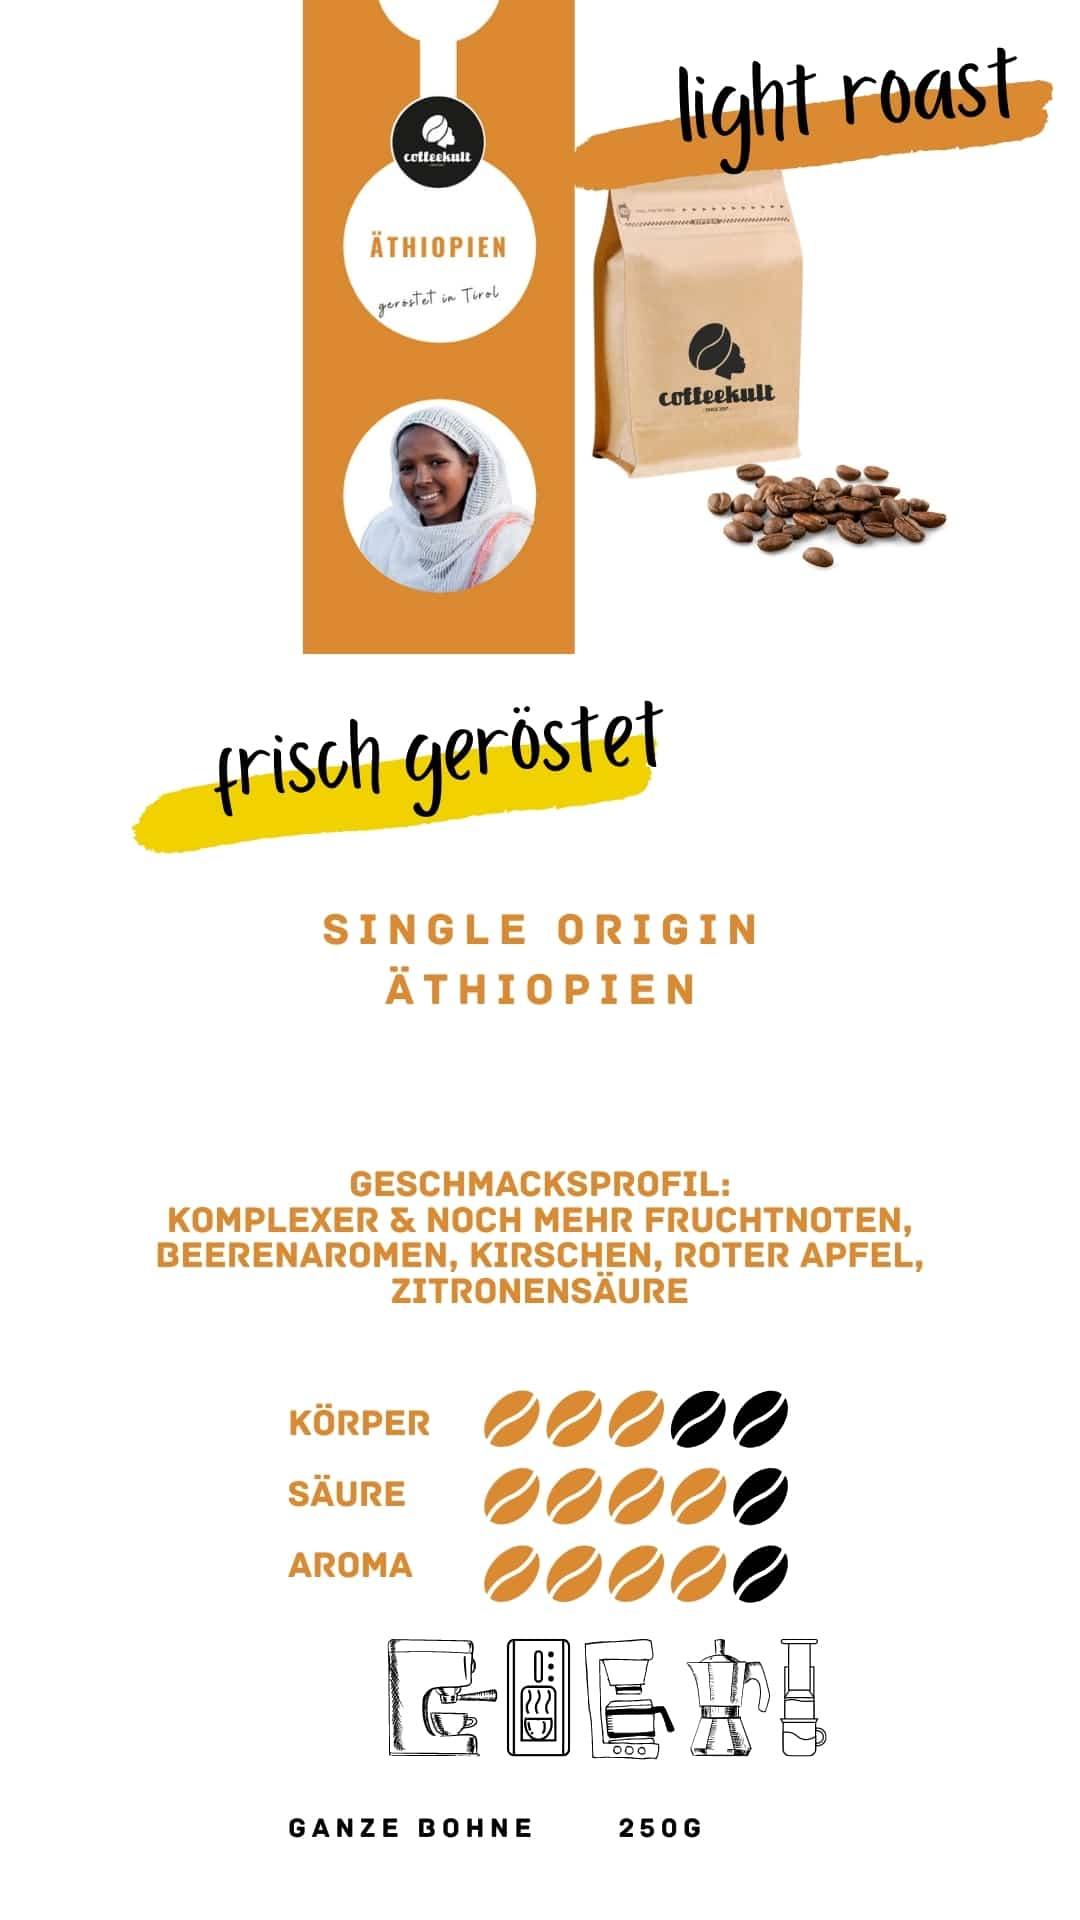 coffeekult coffee frisch geröstet barista kaffeerösterei innsbruck arabica bohnen äthiopien light roast